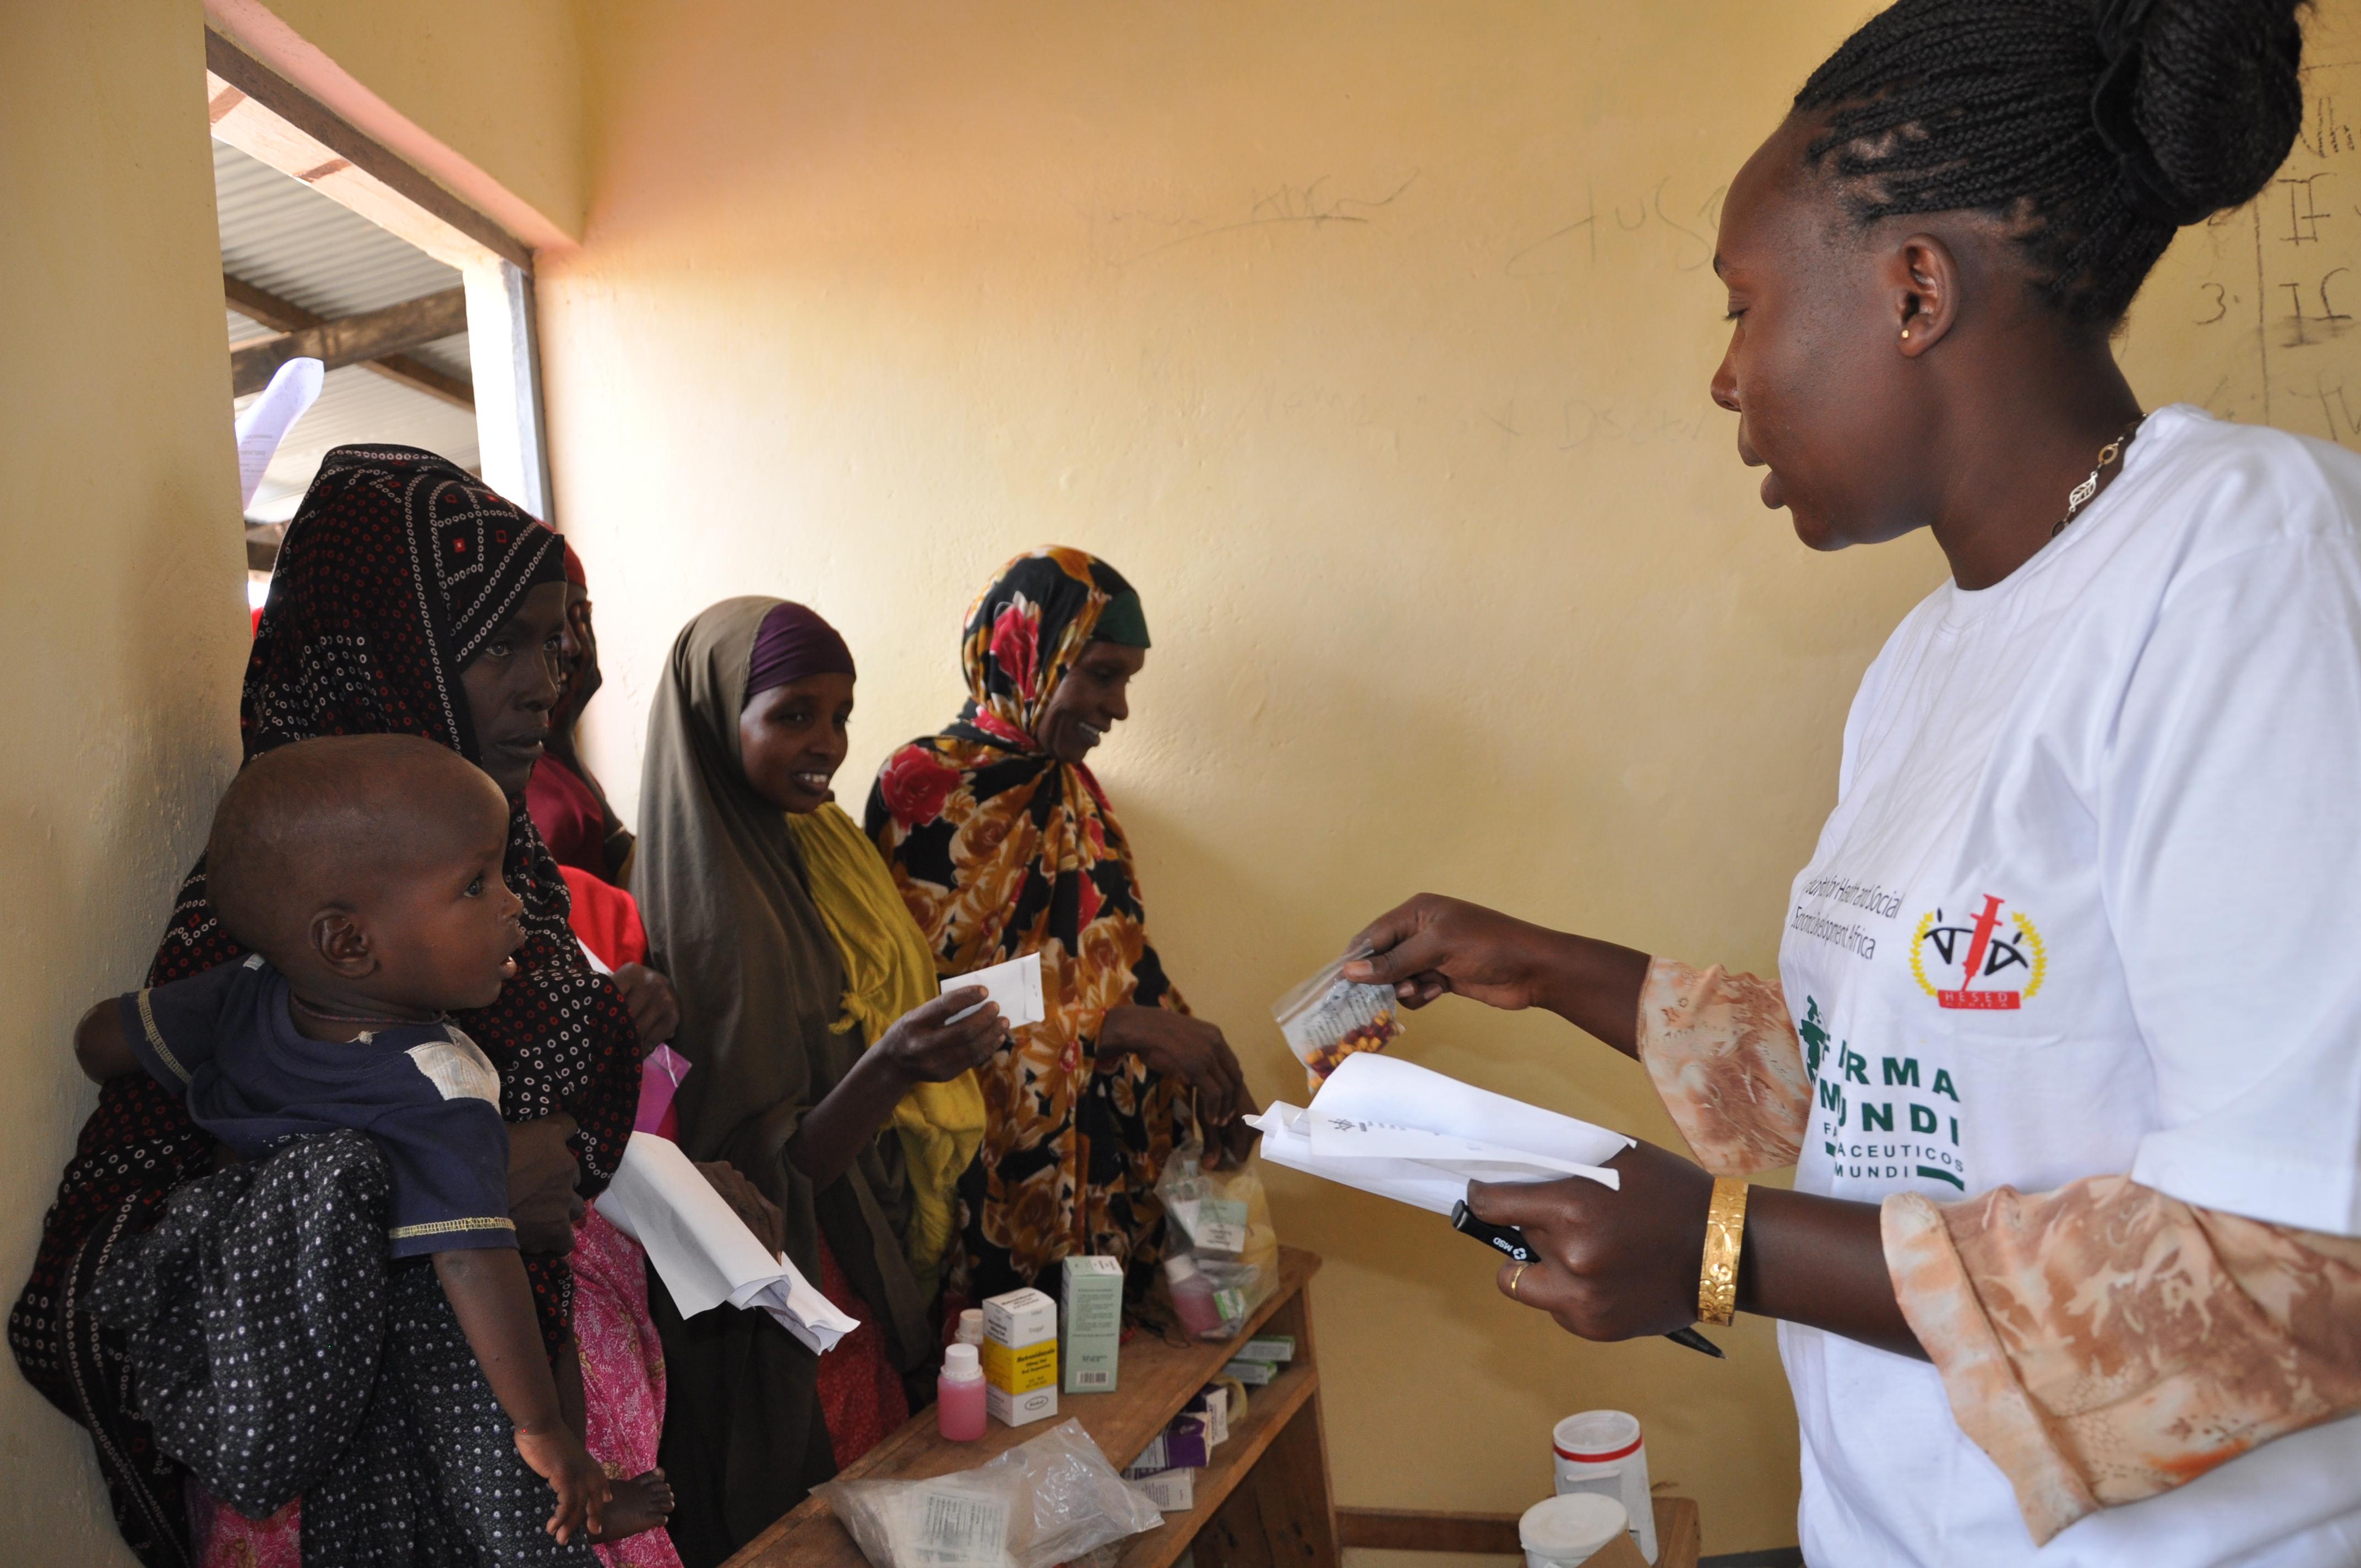 Atención sanitaria en Dadaab, Kenia. /Farmamundi